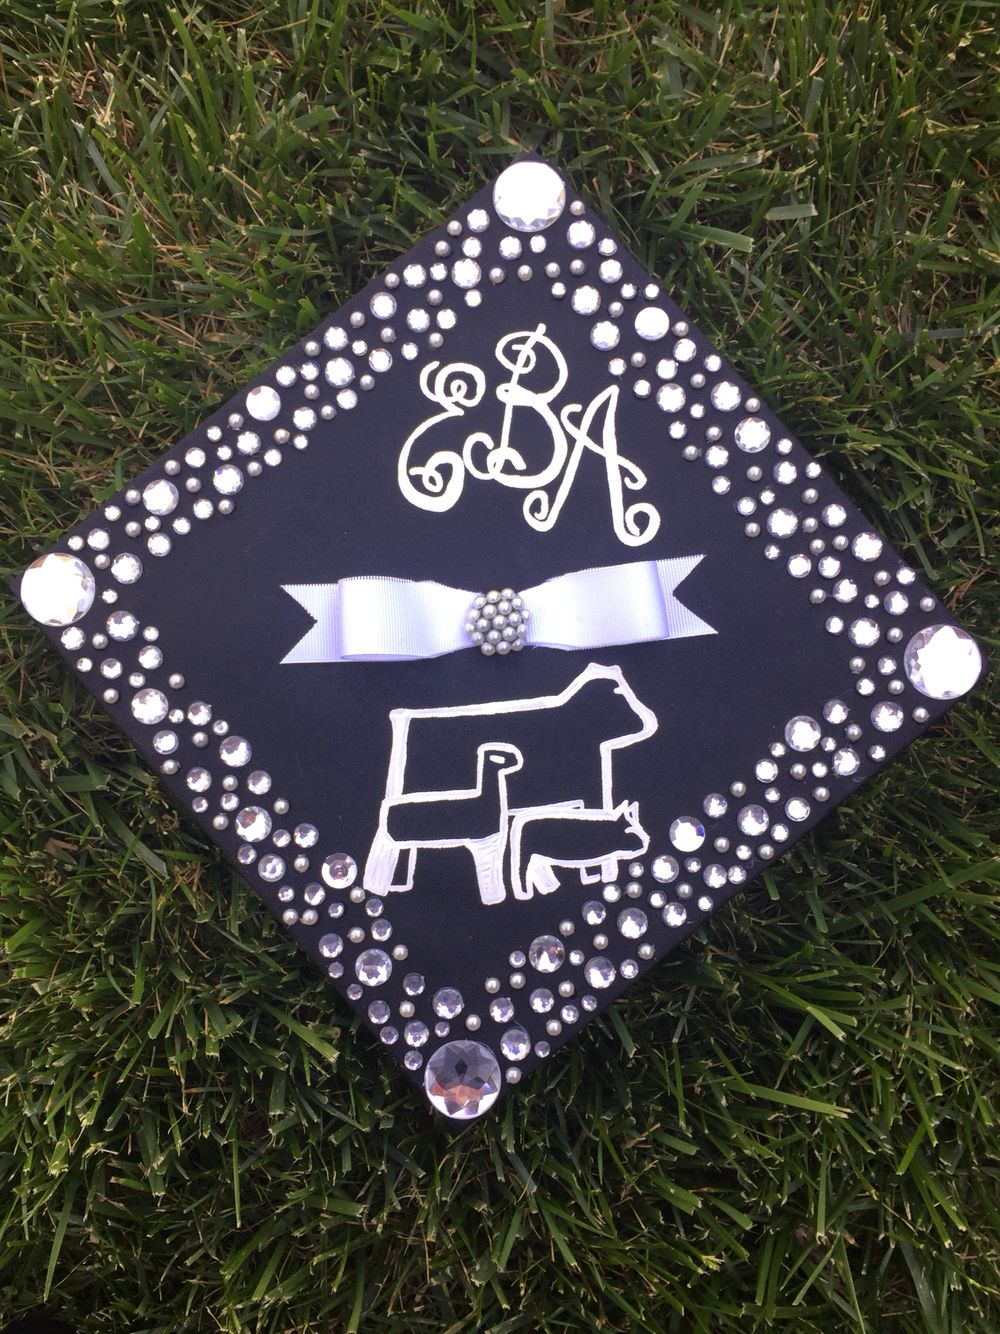 Decorating graduation cap ideas for teachers - Animal Science Graduation Cap Pearls And Rhinestones